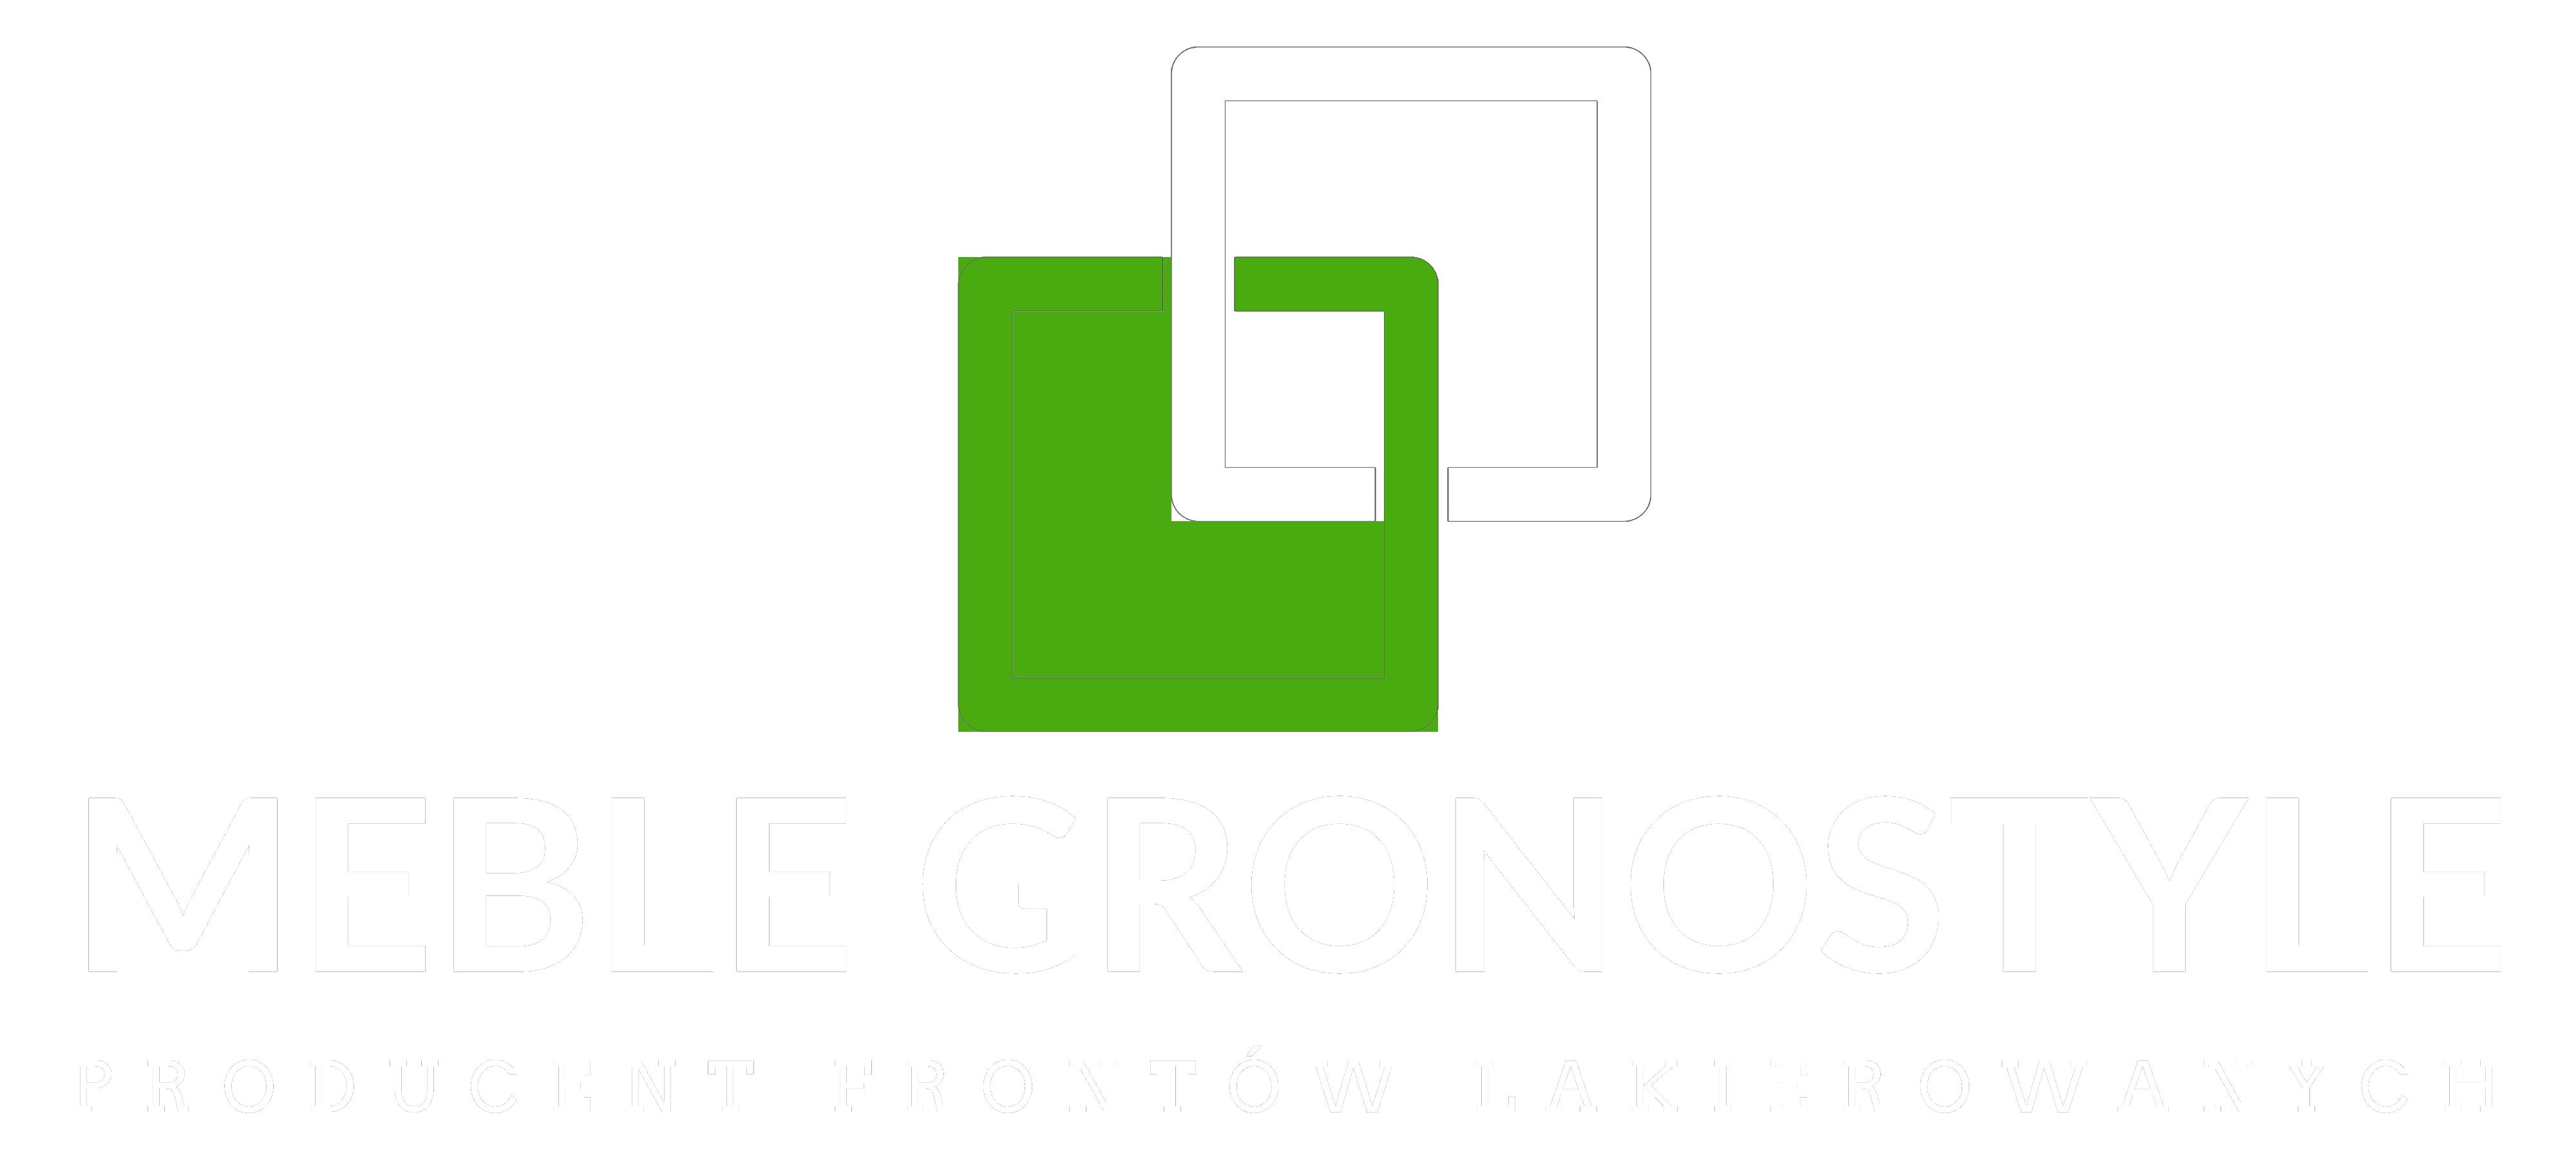 Meble Gronostyle